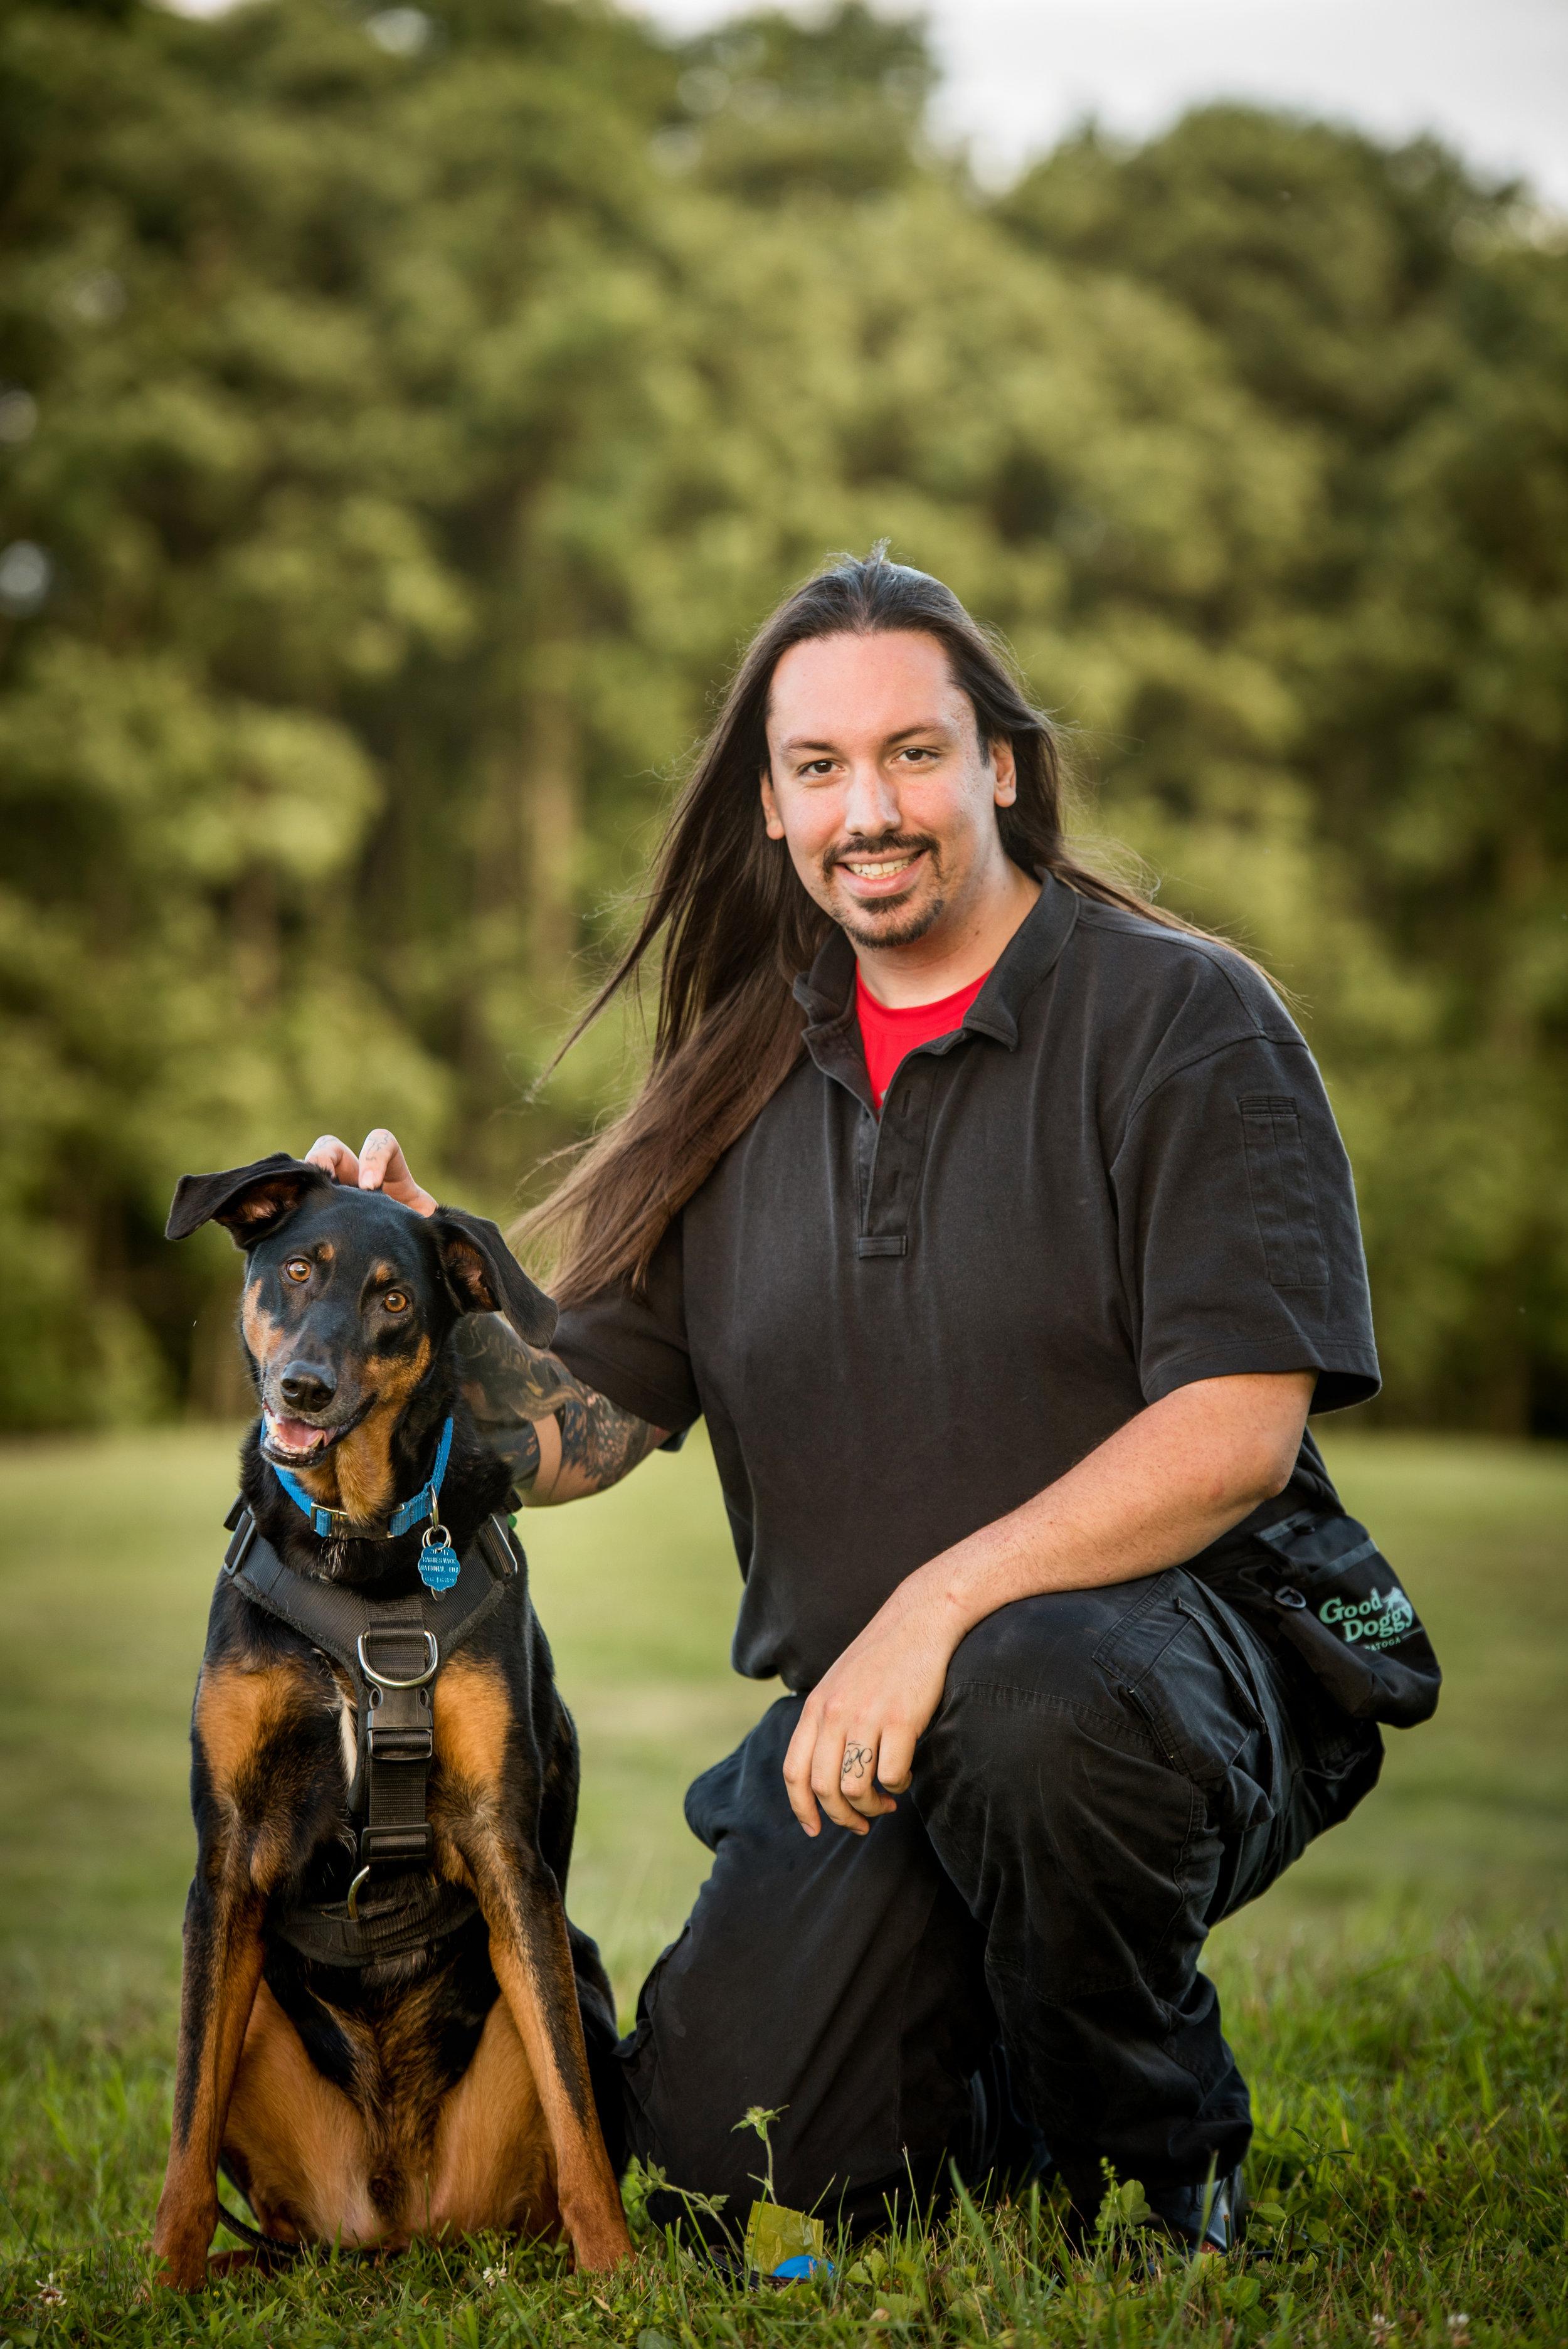 Ben with his dog fenris